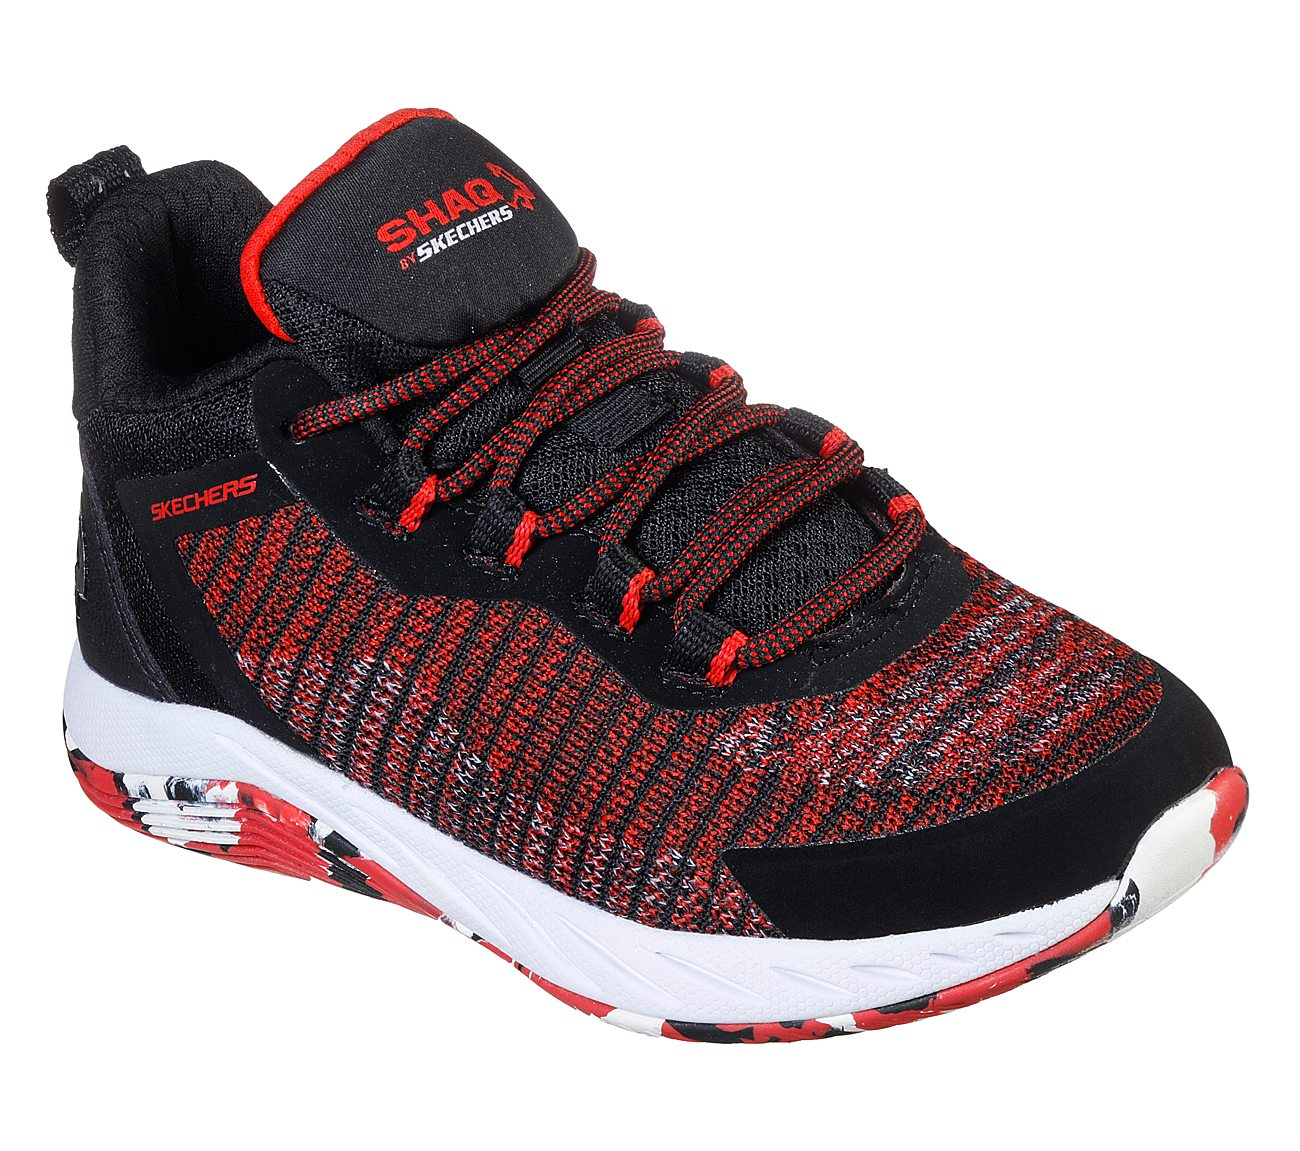 skechers sneakers shoes